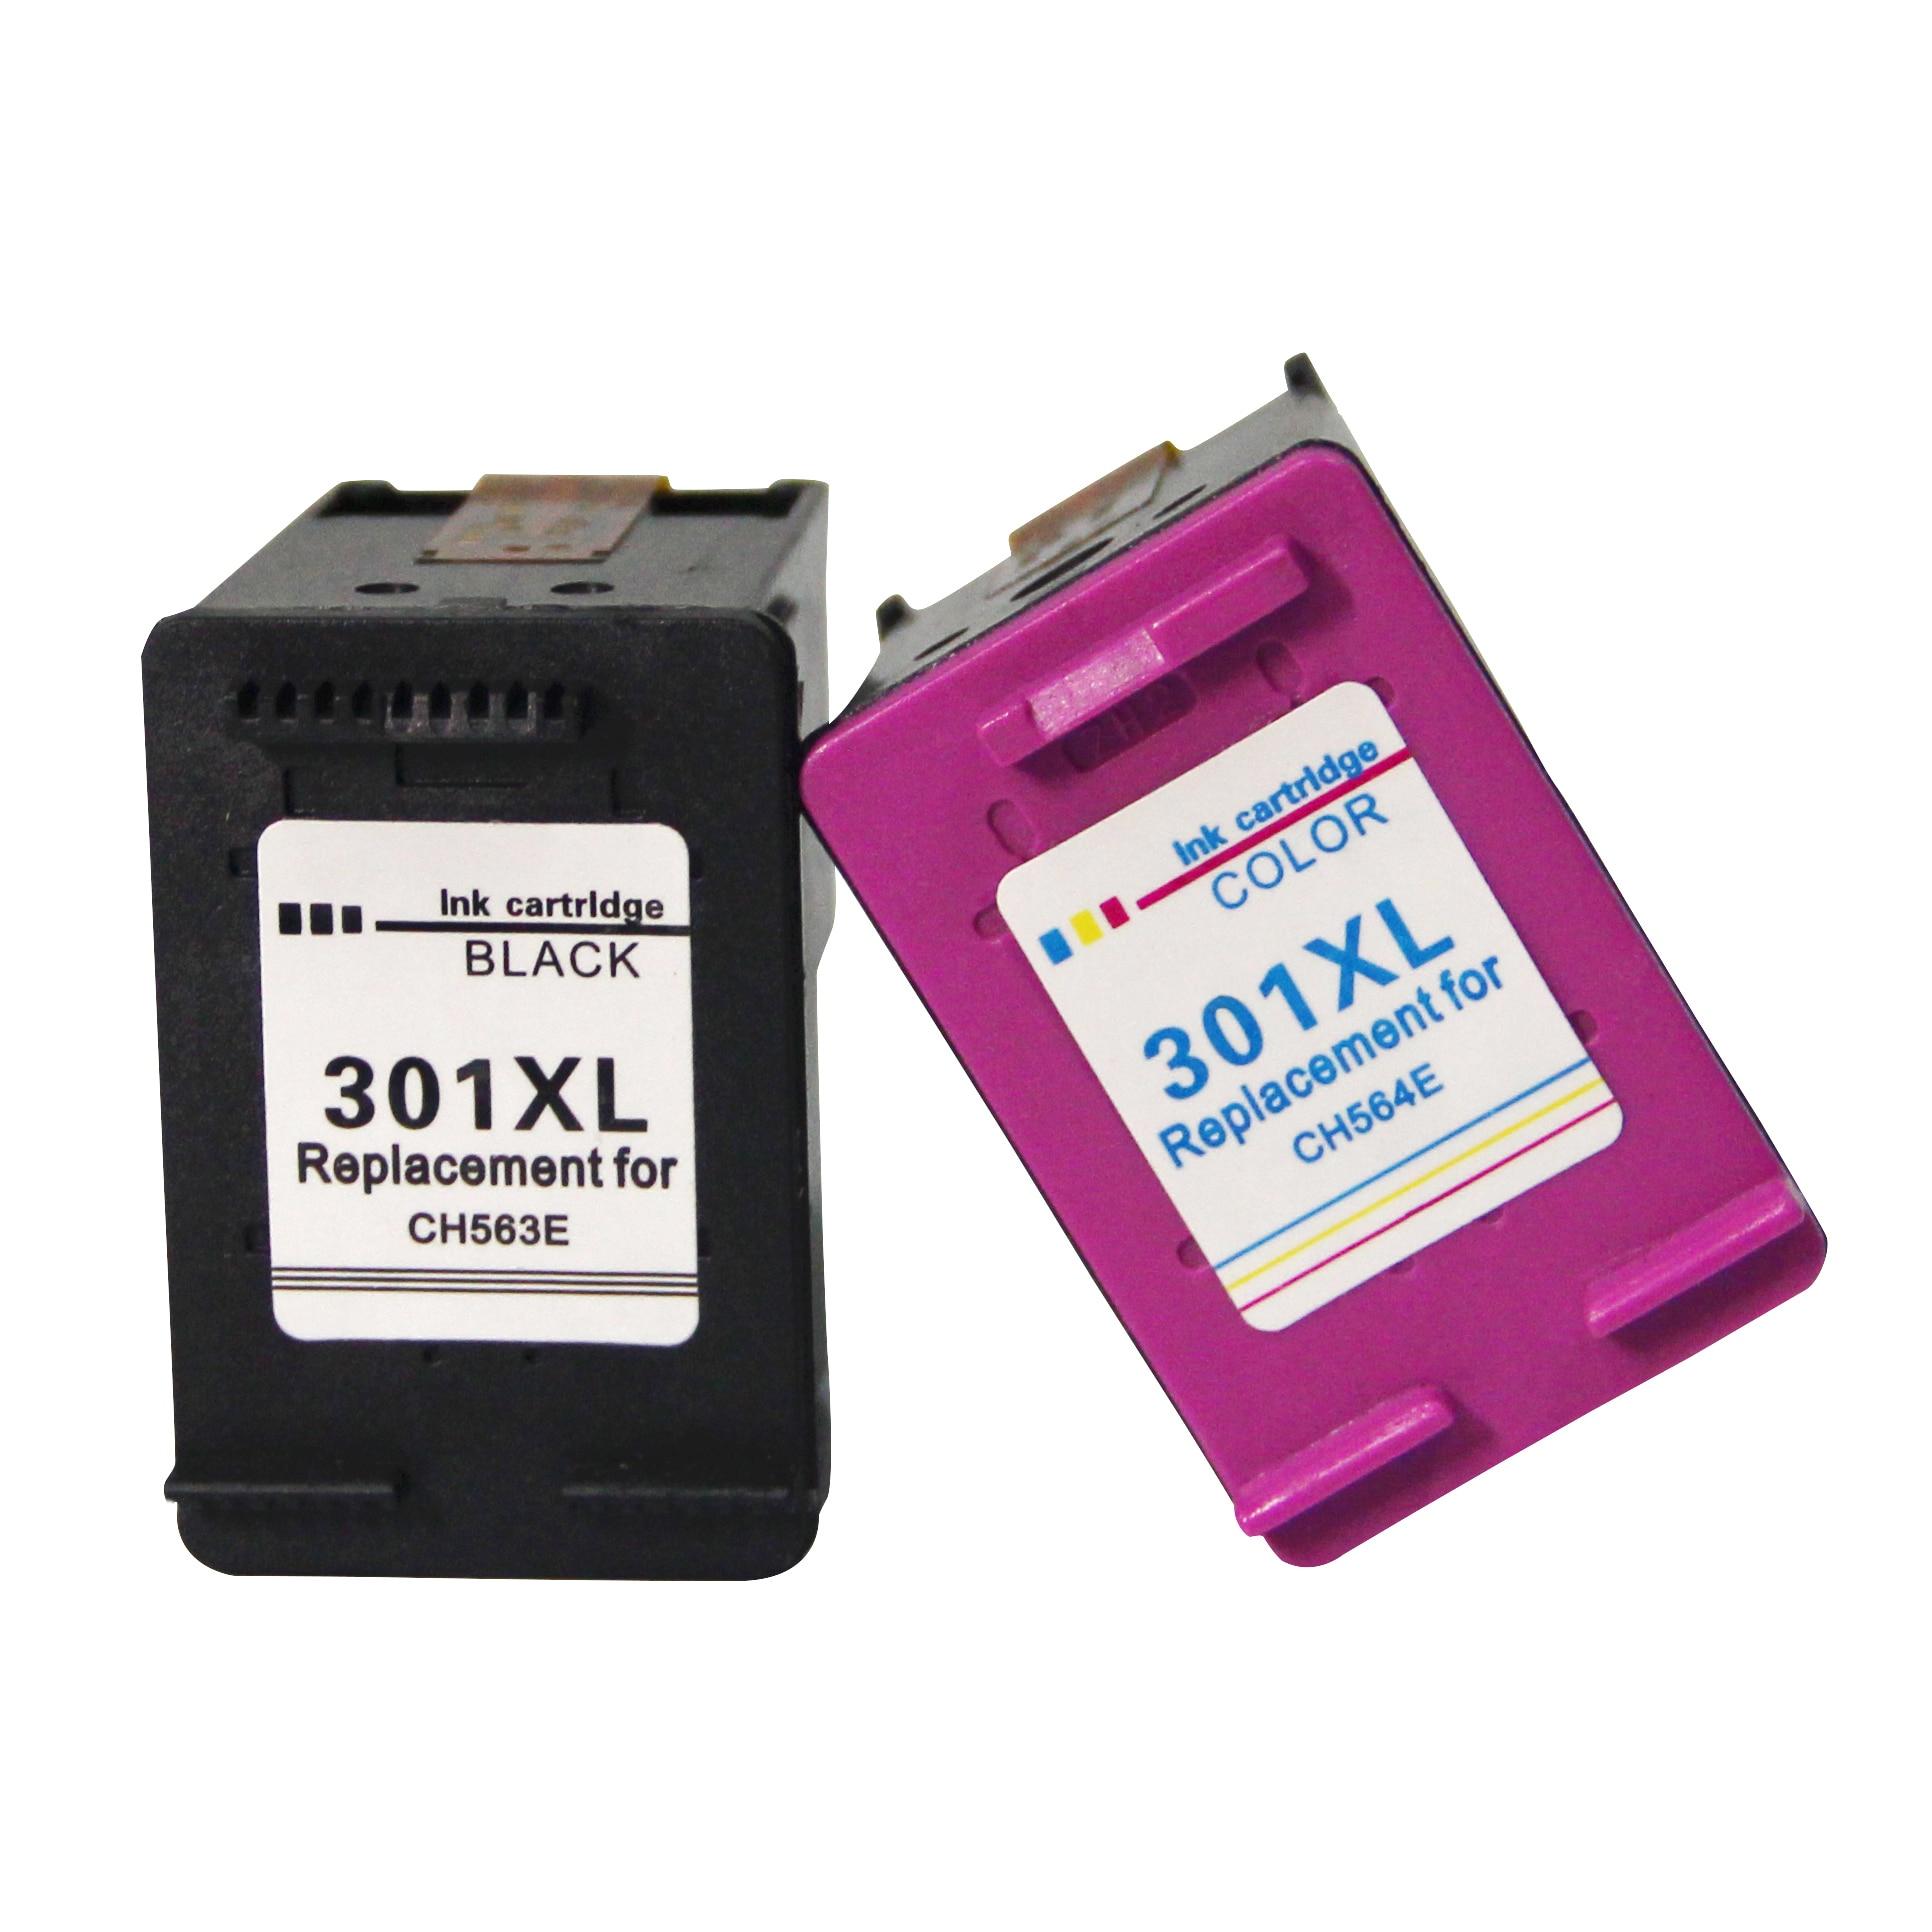 Remanufactured 301XL HP 301 HP Deskjet 1000 1050 2000 2050 2050 2510 3510 3050 3050a 프린터